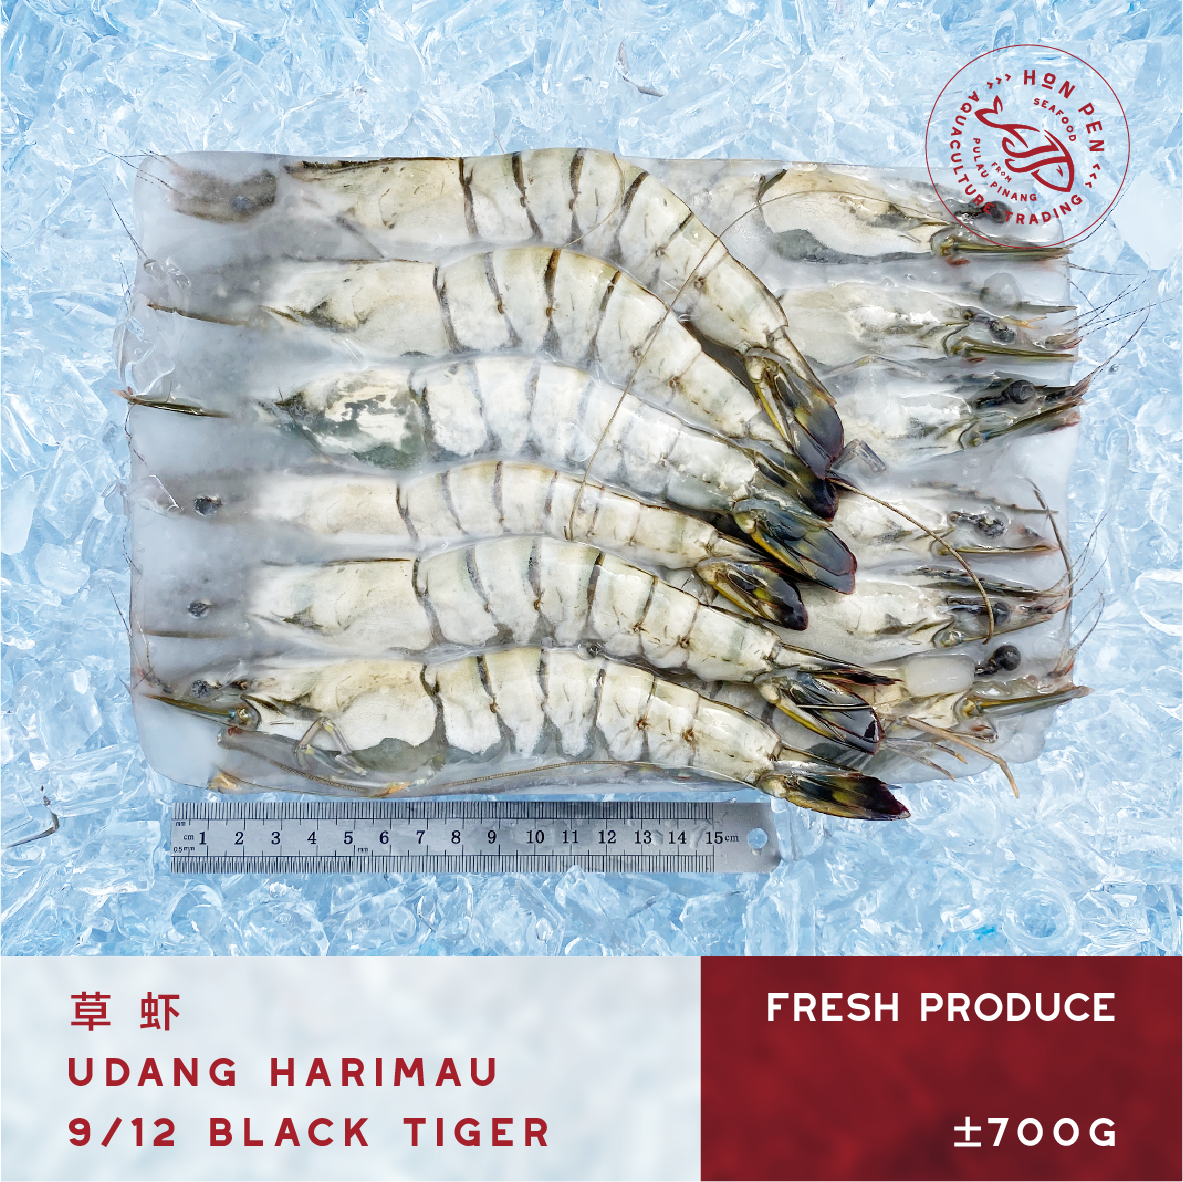 BLACK TIGER 9/12 草虾 UDANG HARIMAU (Seafood) ±700g